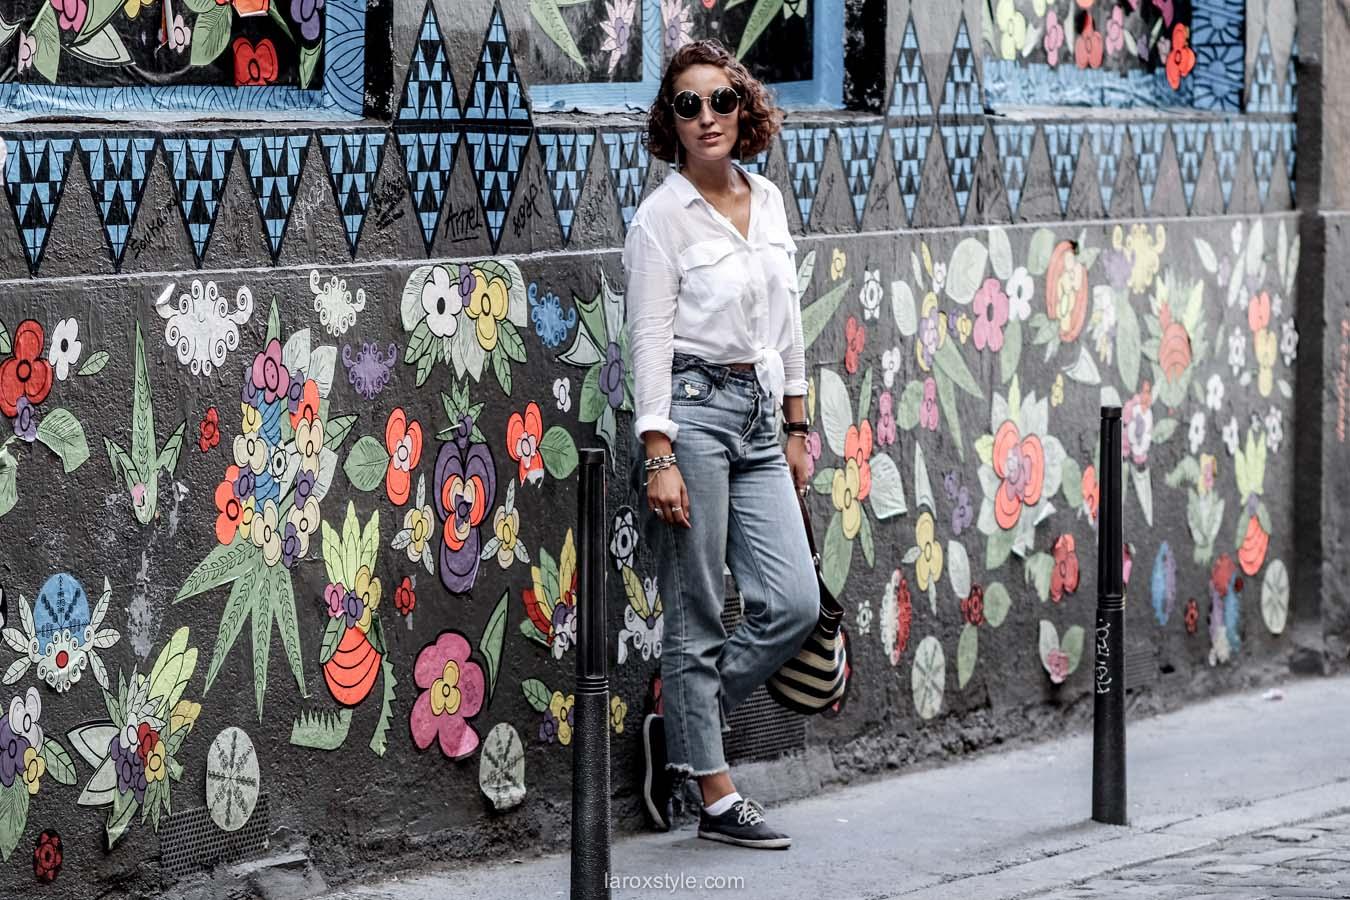 chemise blanche nouee - laroxstyle - blog mode lyon